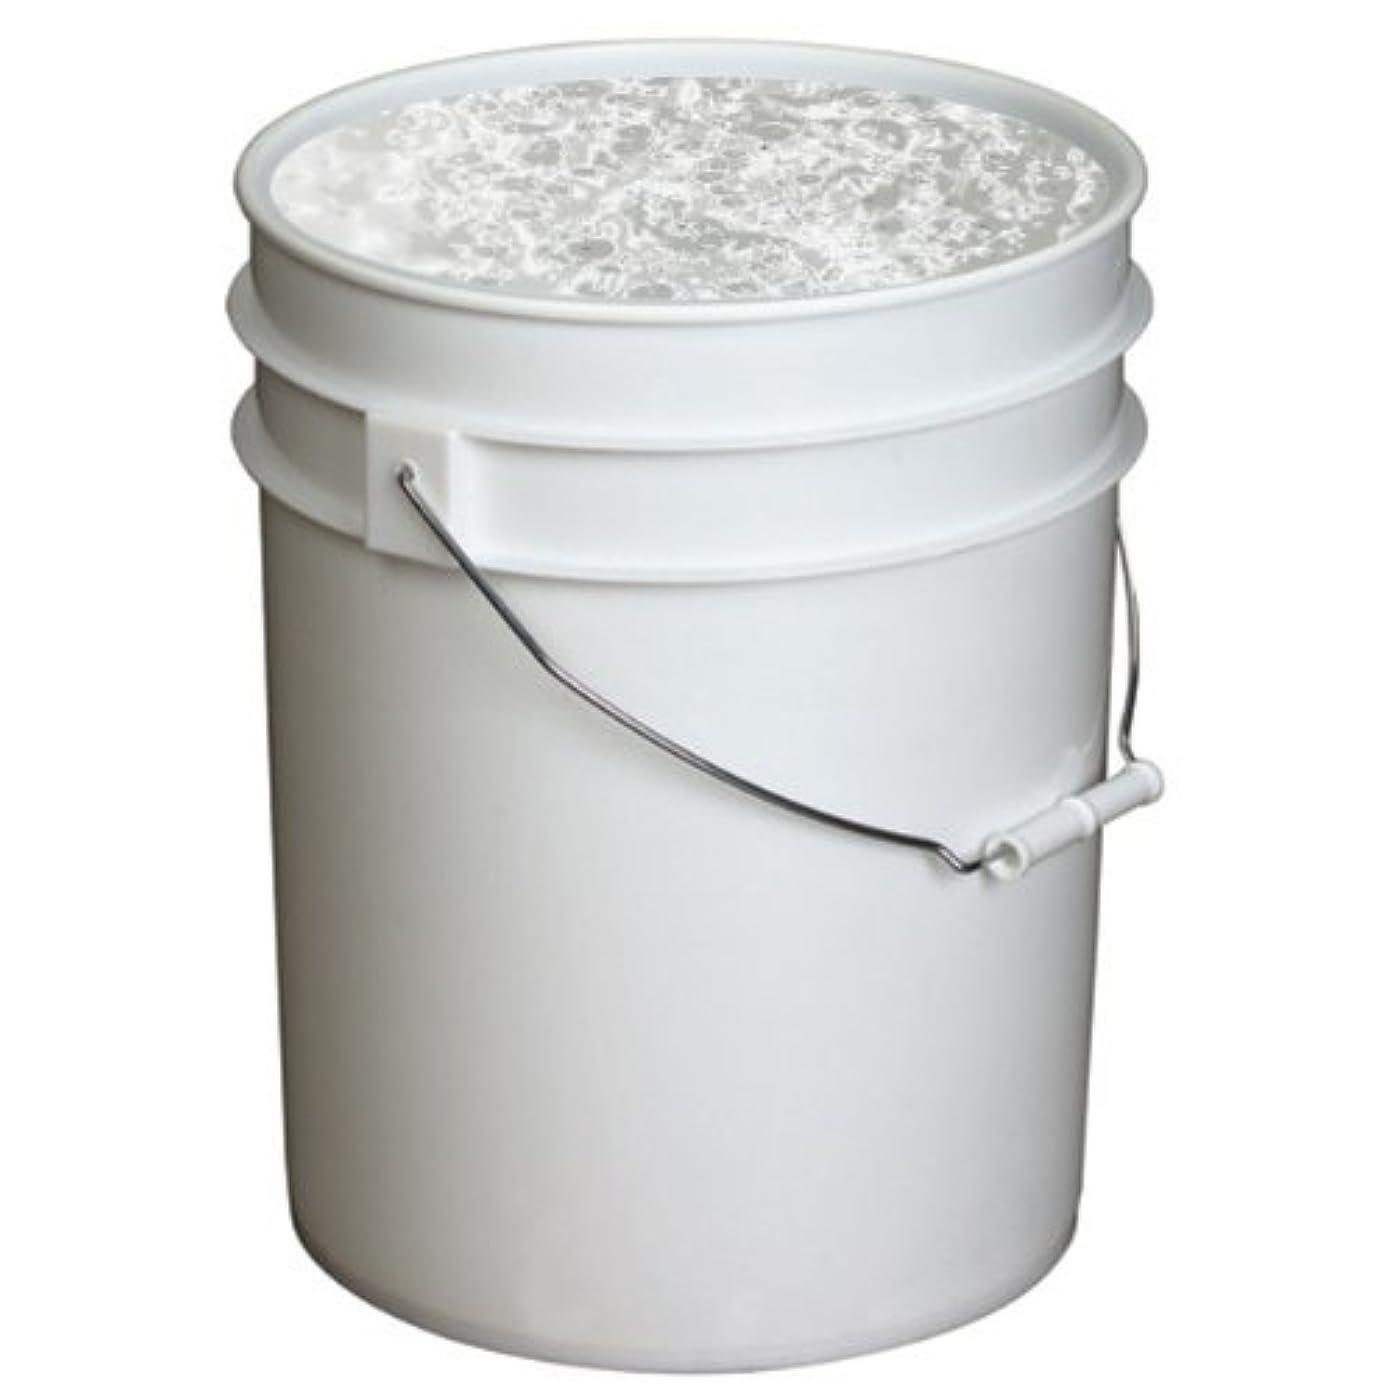 Handy Art UV Neon Event Paint in Bucket, 5-Gallon, White